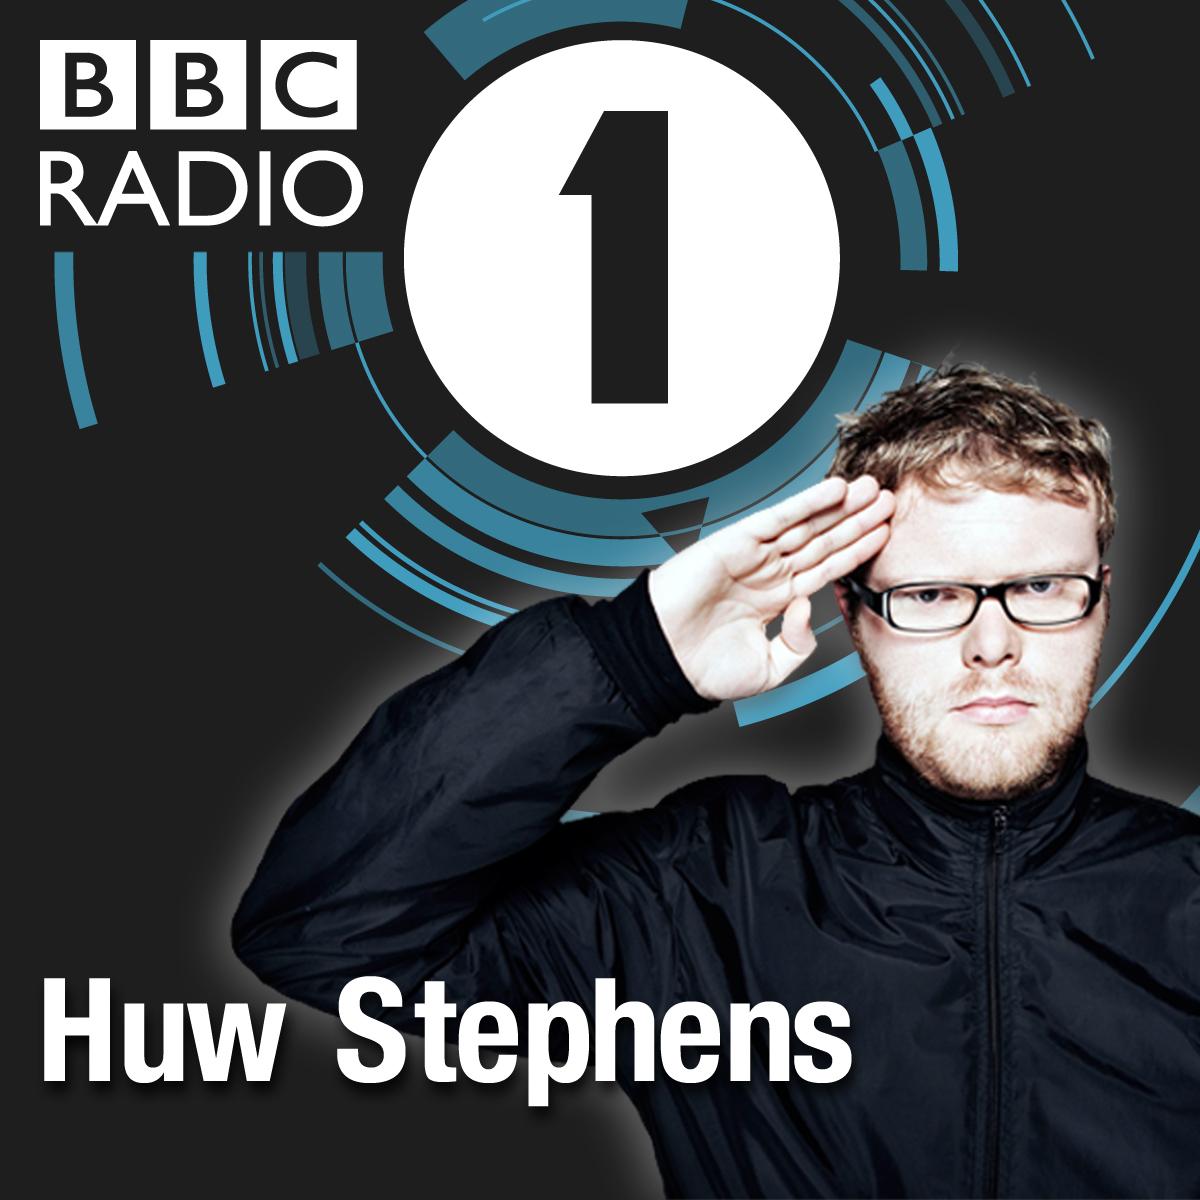 Huw Stephens